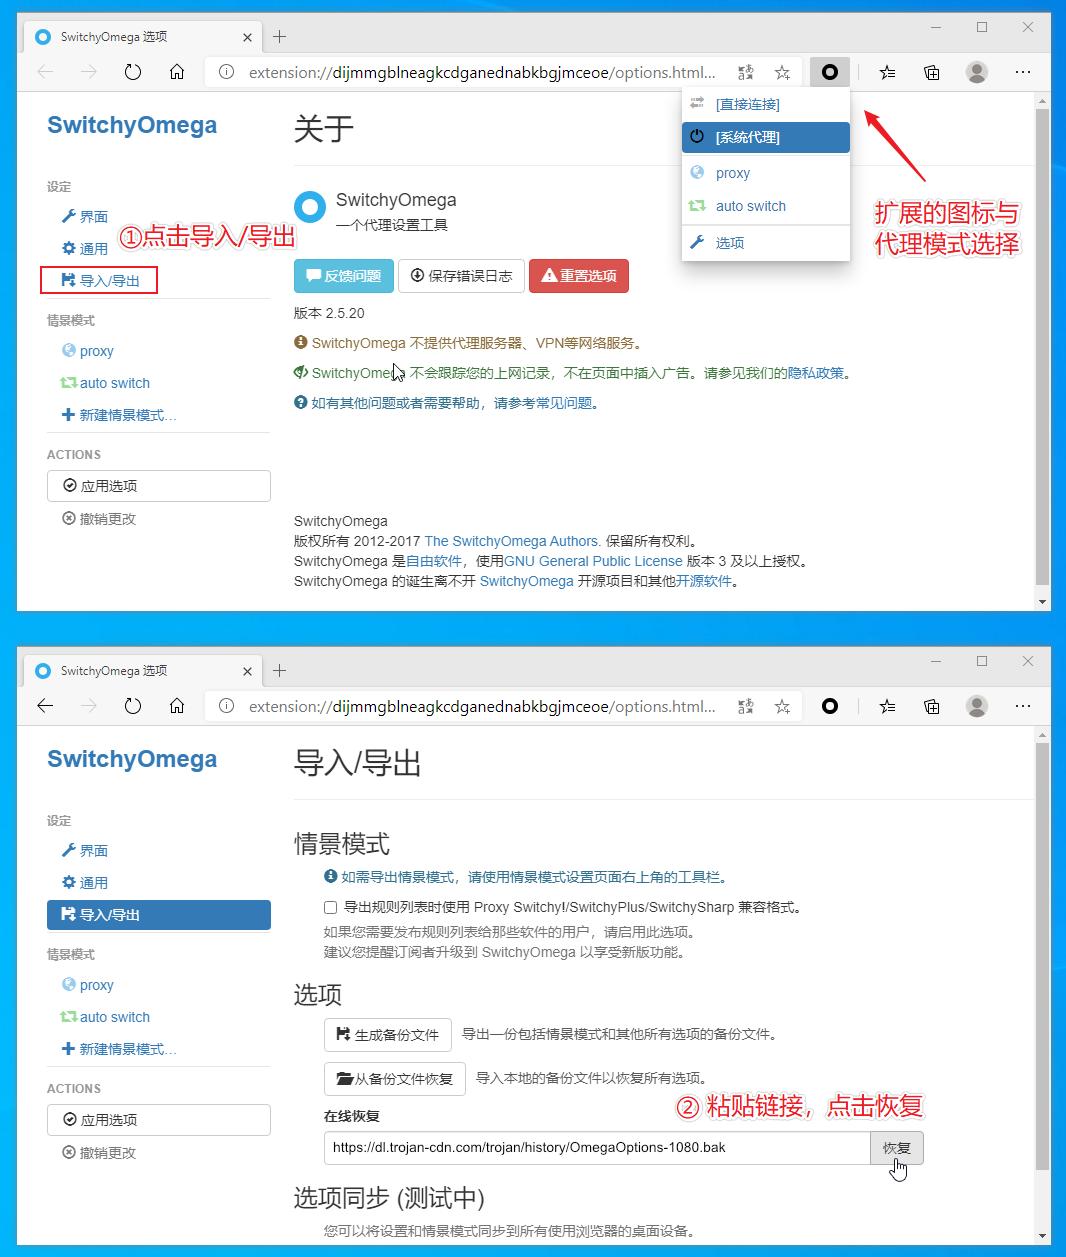 browser-edge-restore-link.png